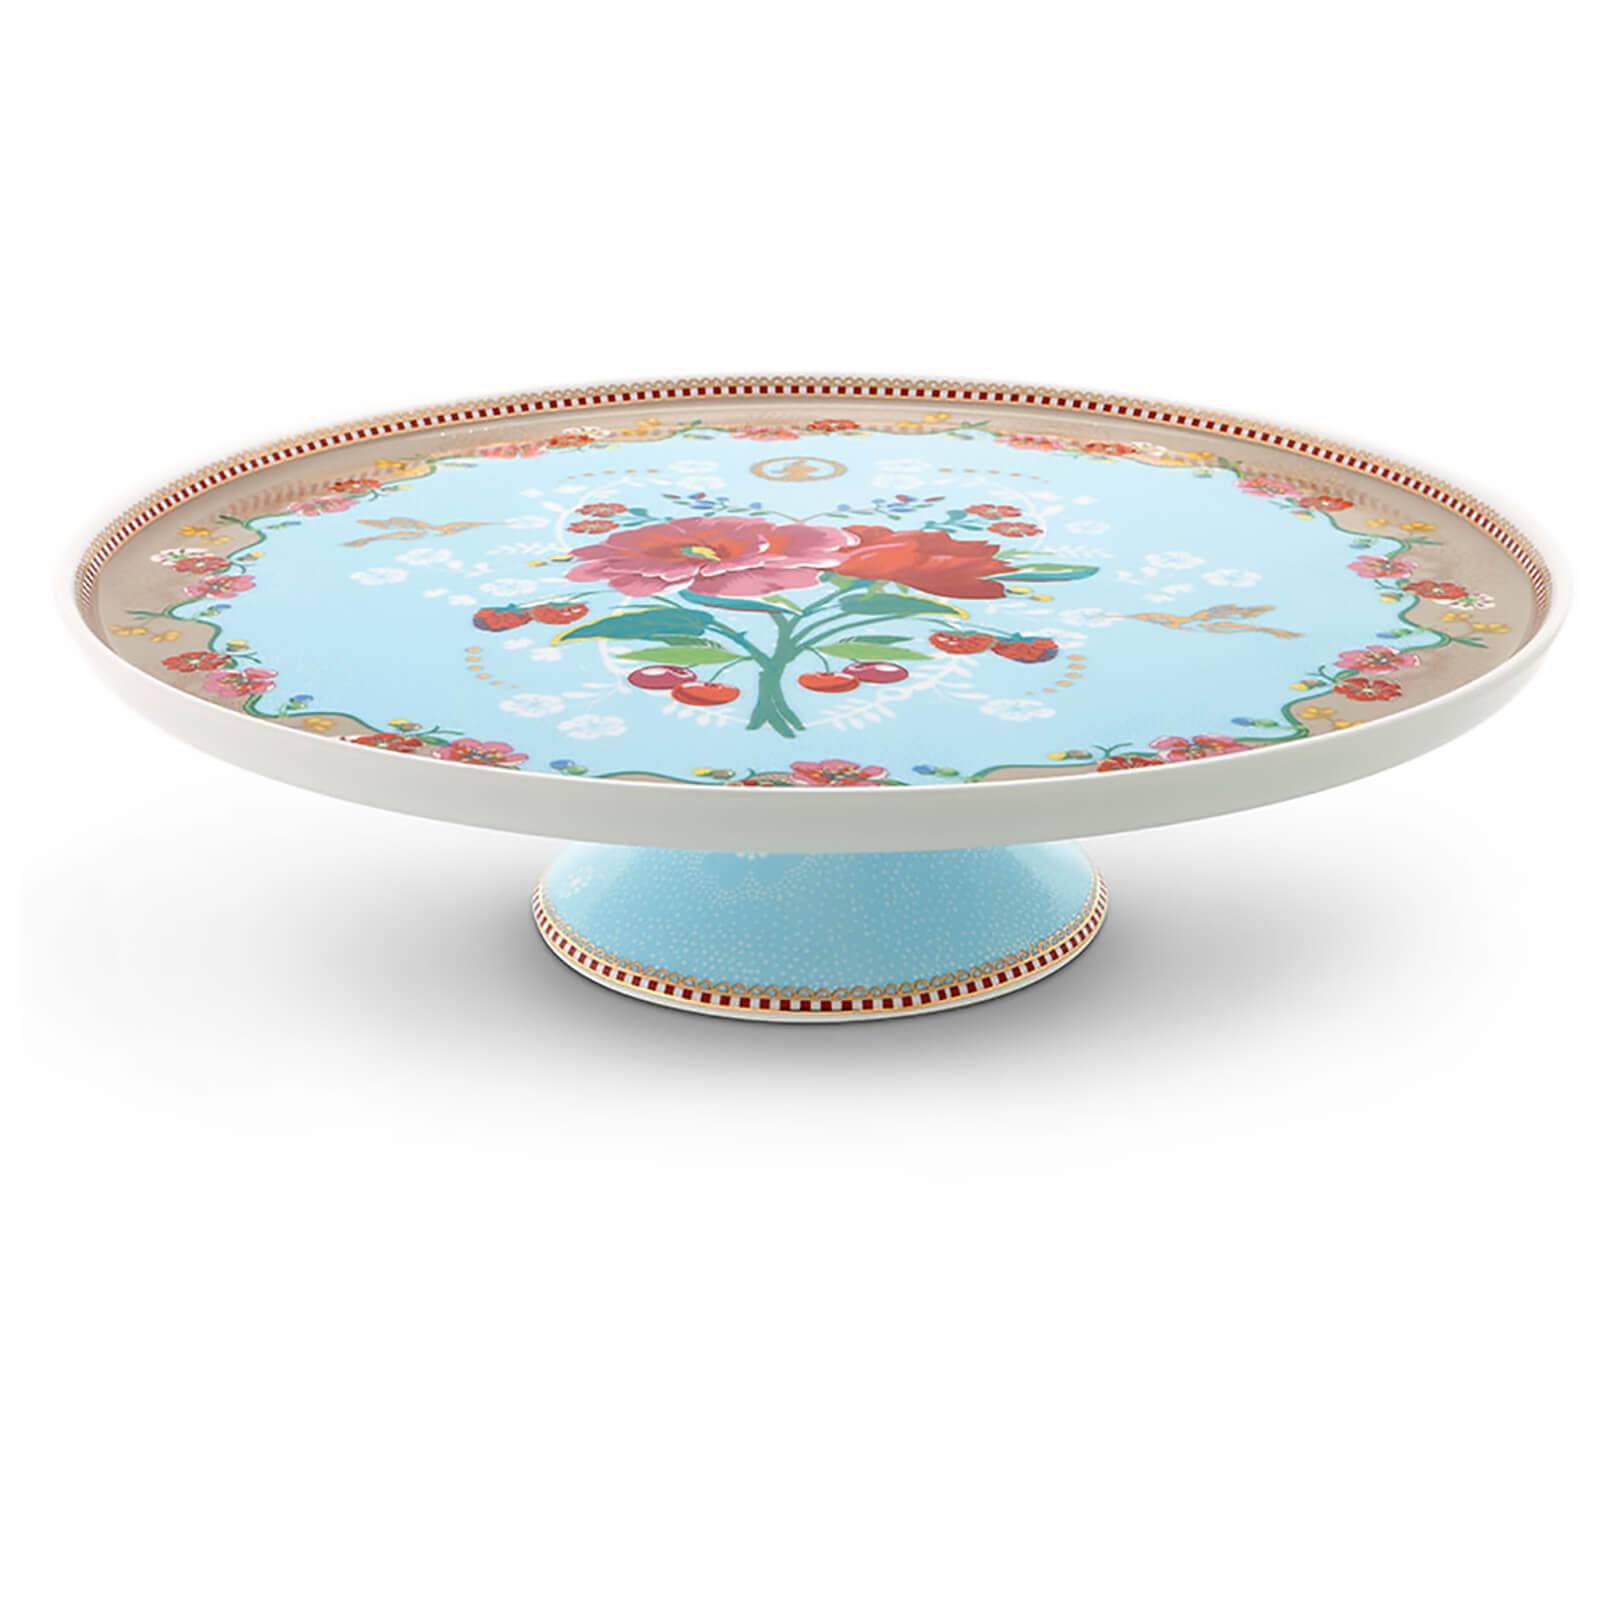 Pip Studio Rose Cake Tray - Blue